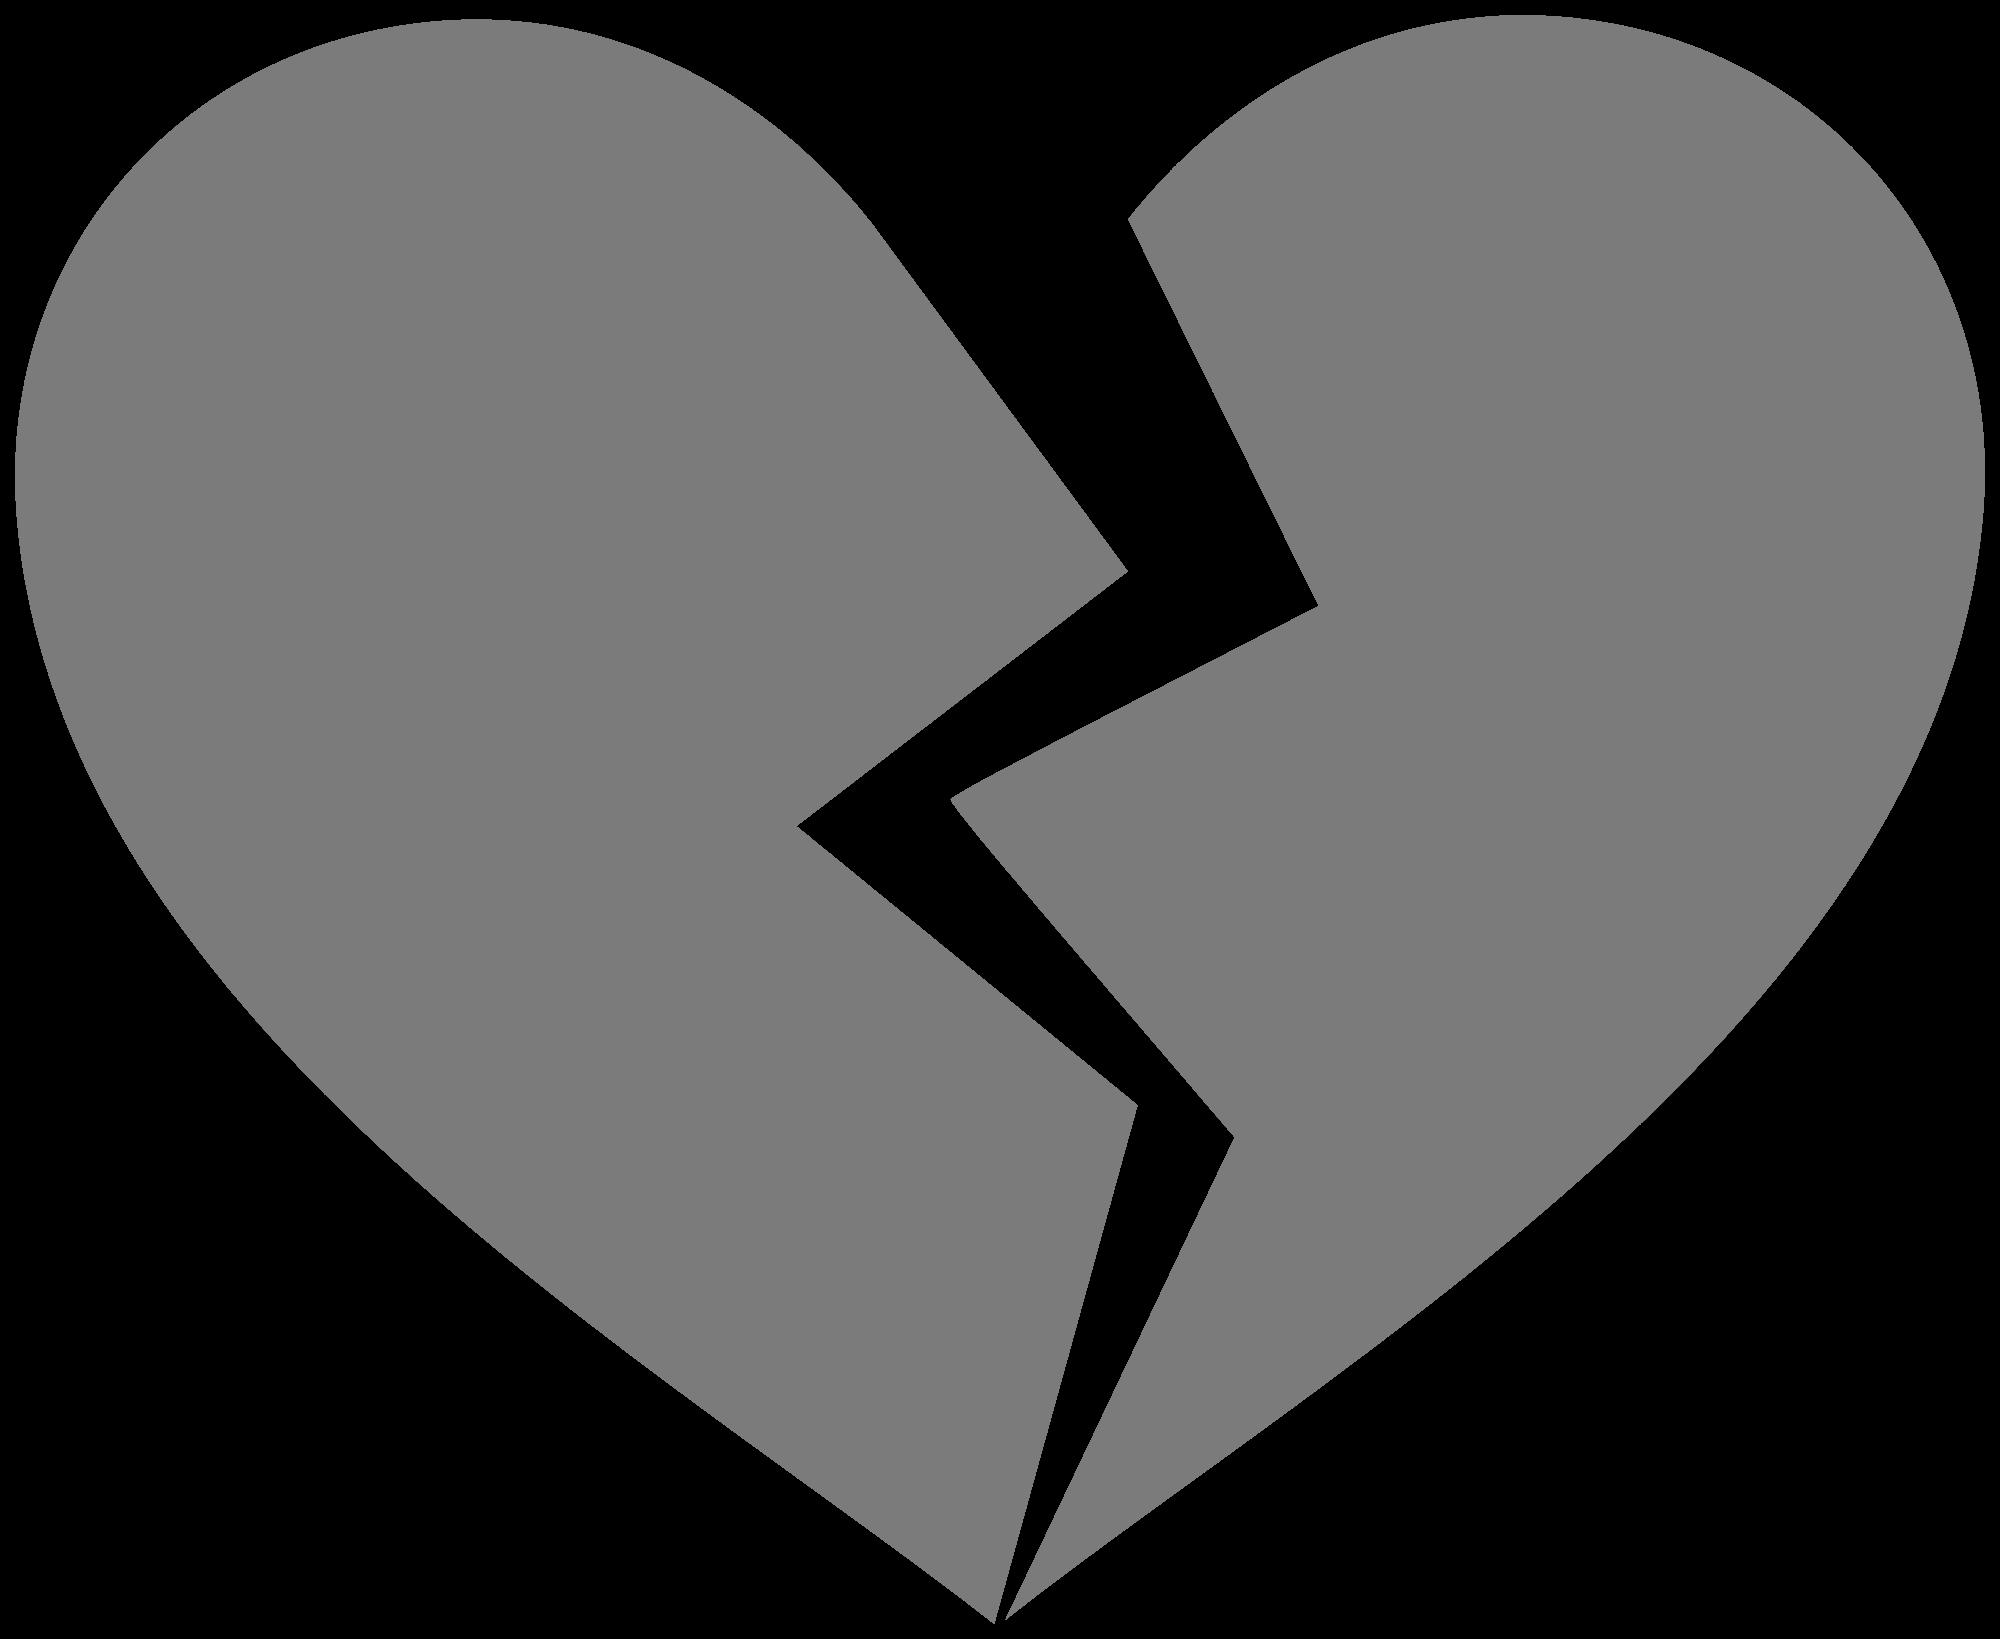 Person clipart broken hearted. Heart cilpart fresh ideas